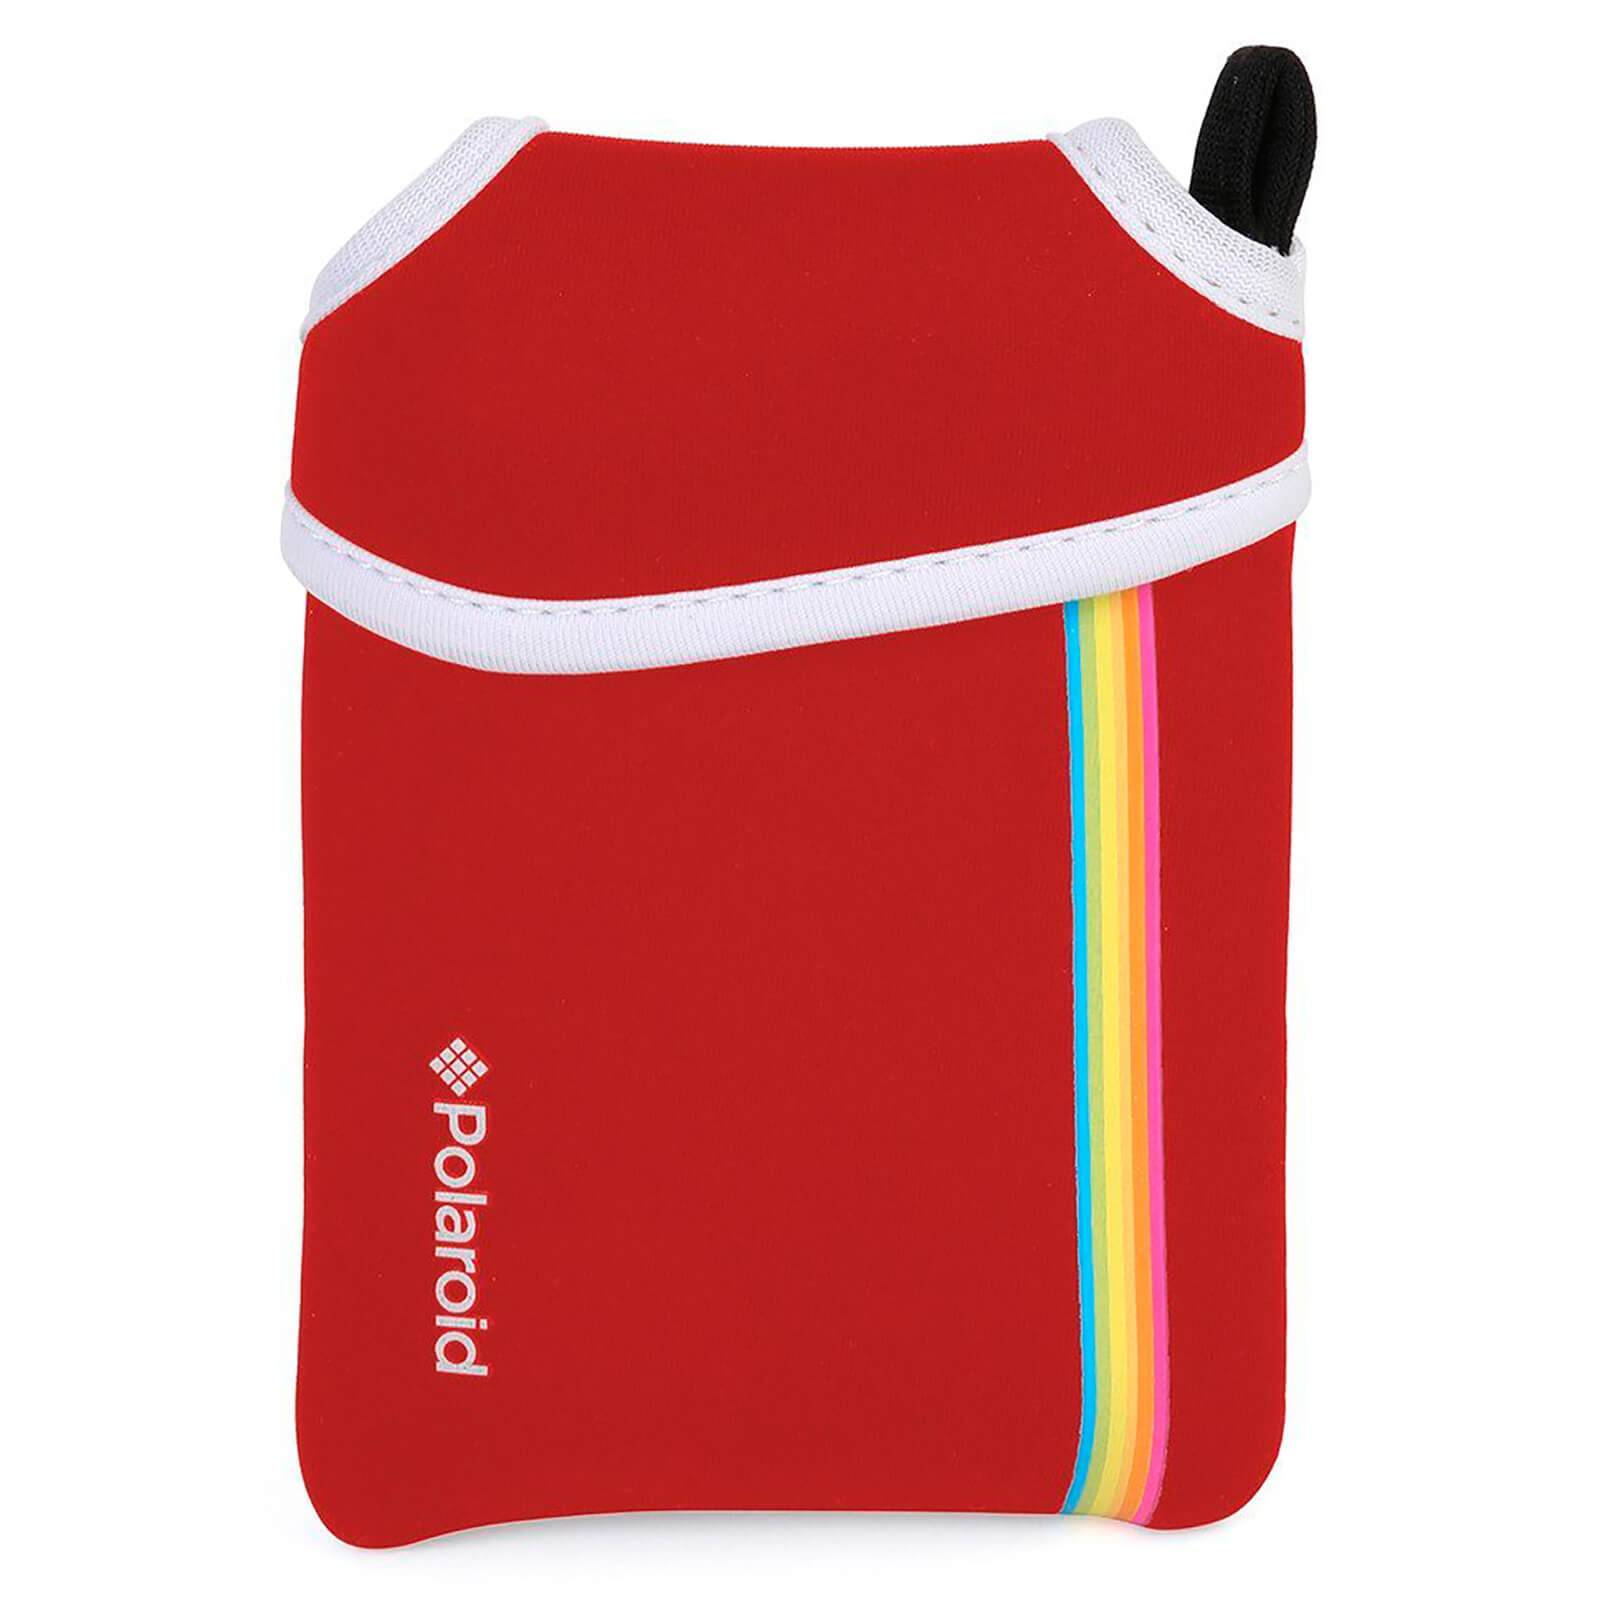 Polaroid Neoprene Pouch (For Zip Instant Mobile Printer) - Red